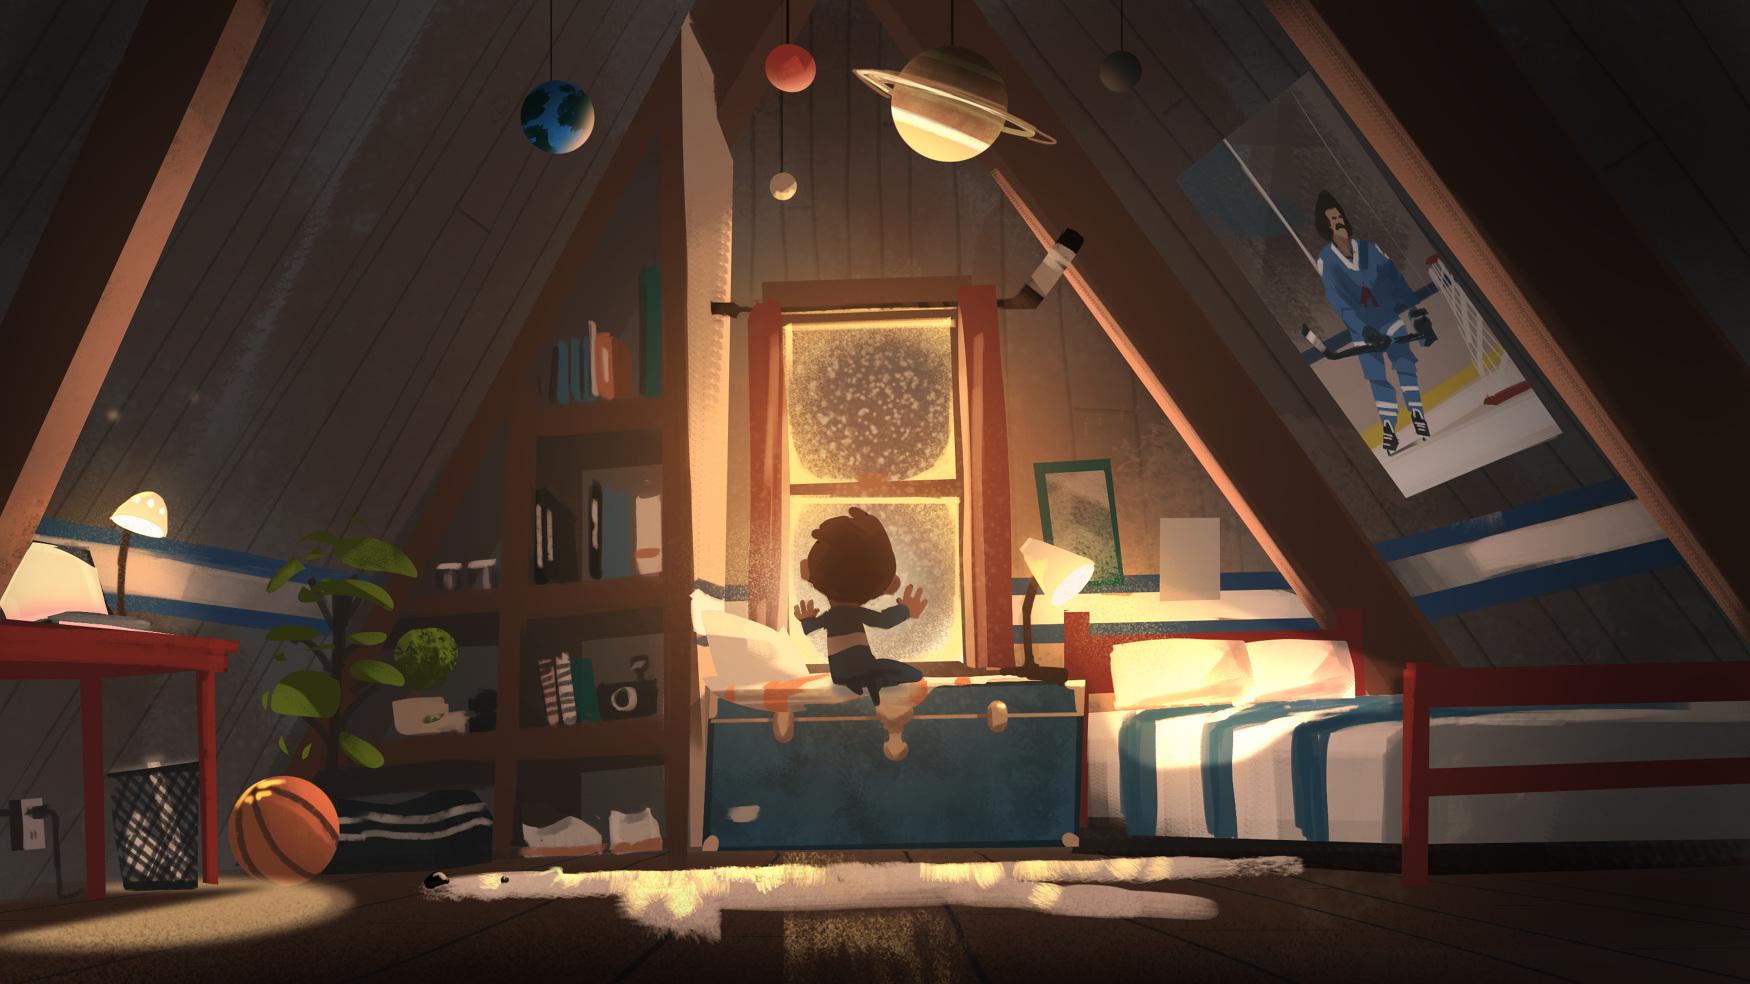 home_interior_bedroom_01_1750.jpg